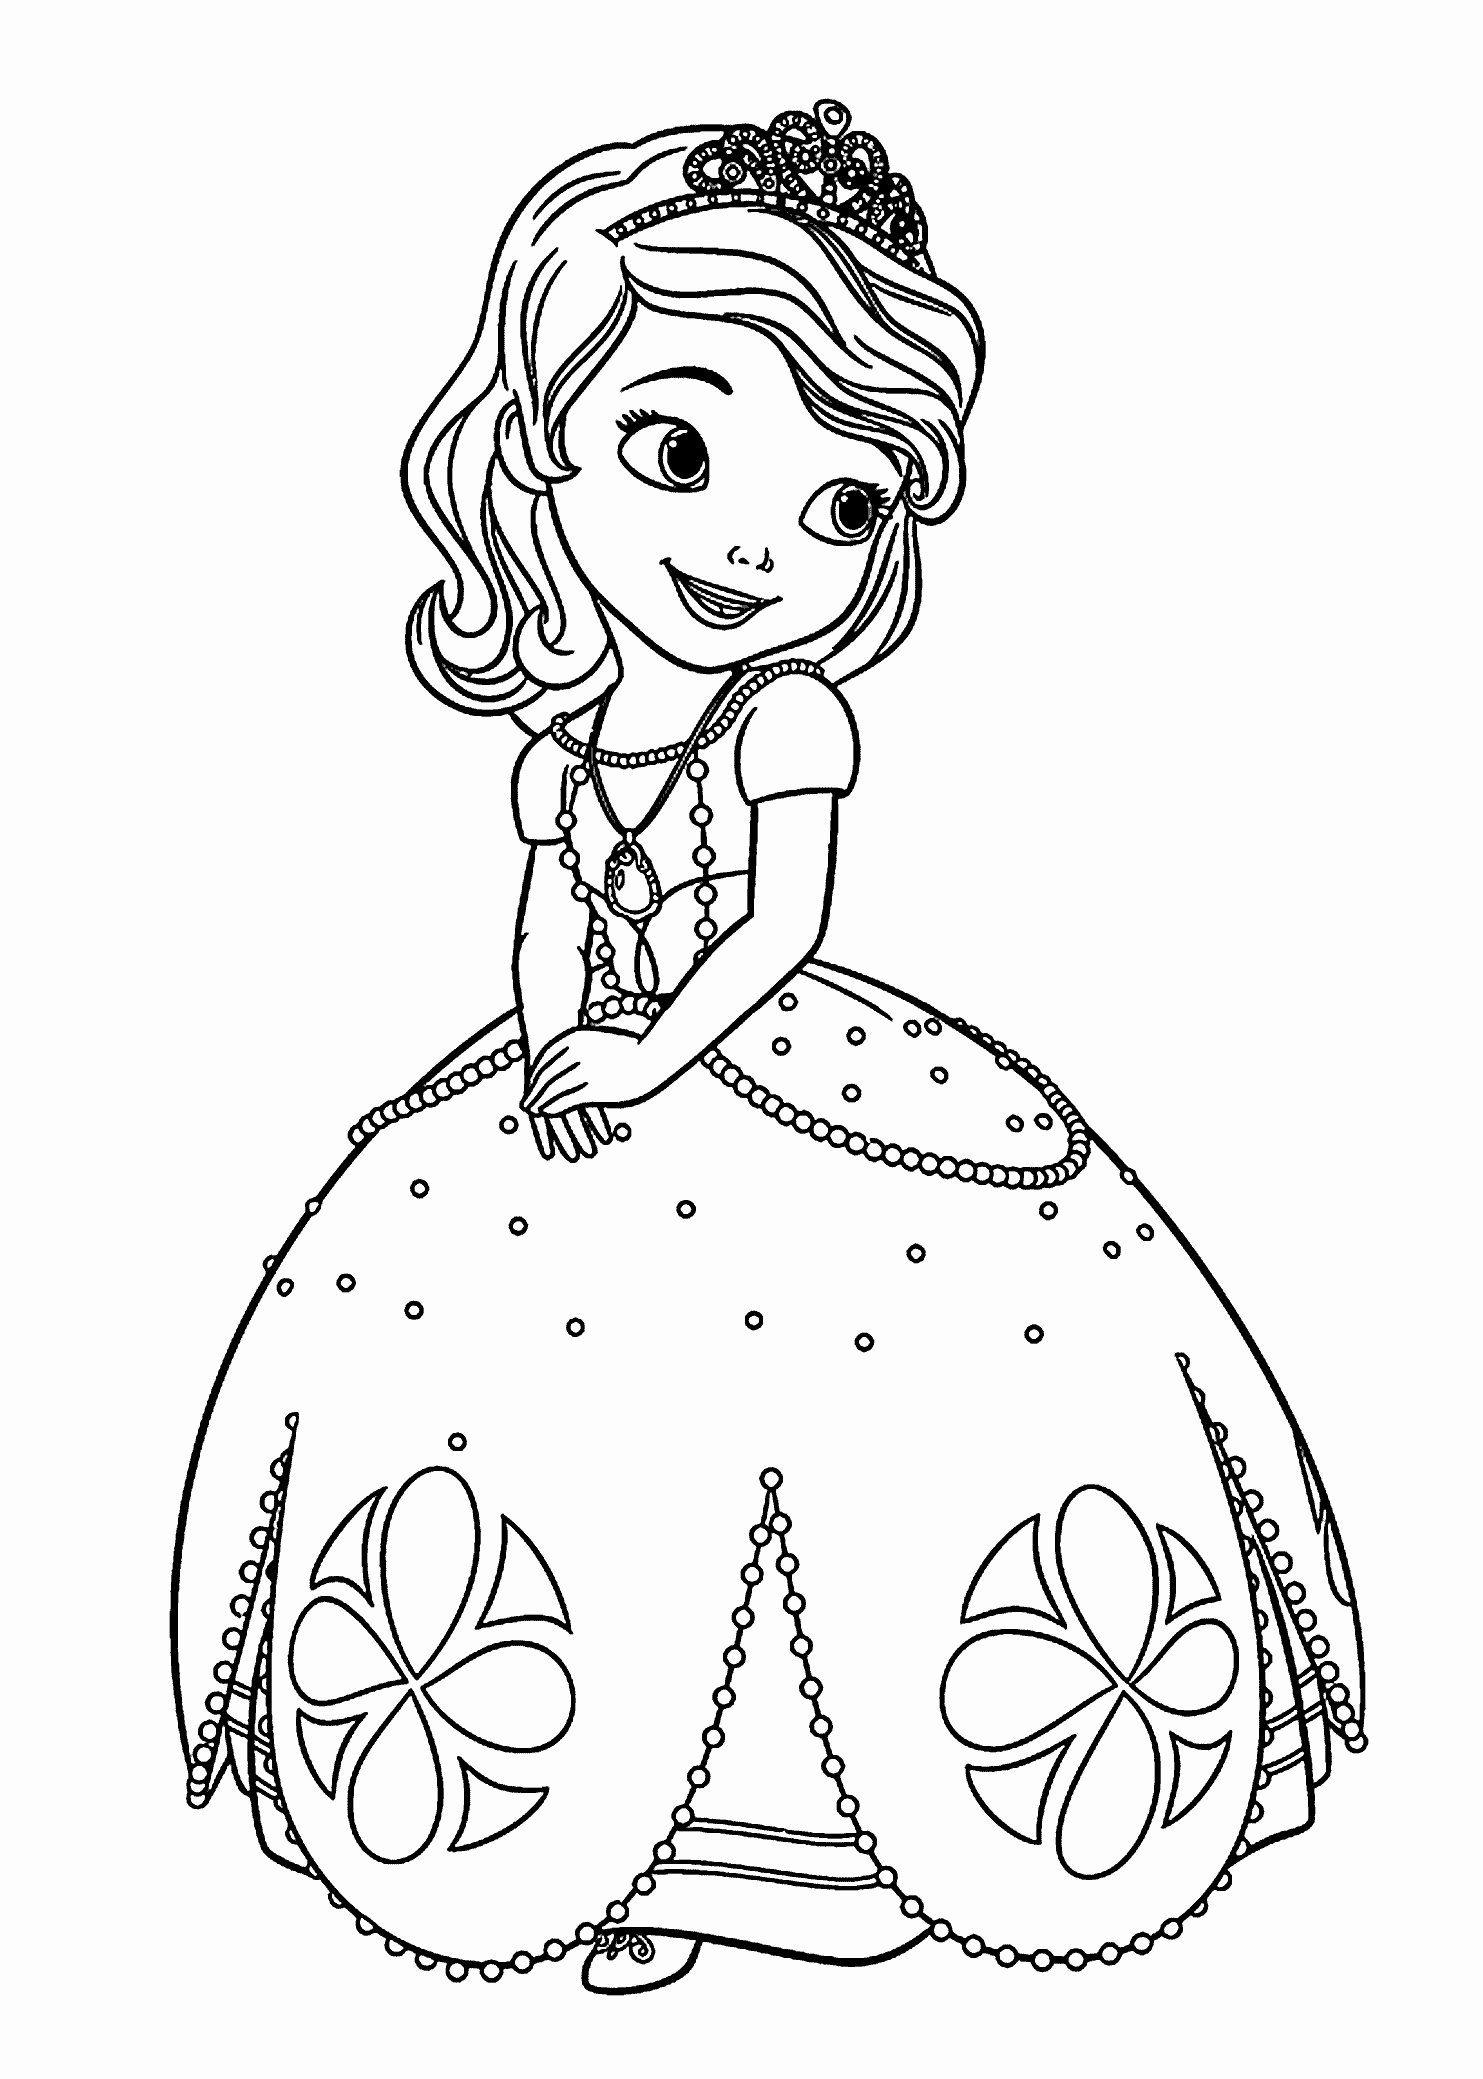 Coloring Pages For Girls Princess New Premium Coloring Page Little Girl Many Beautiful Disney Buku Mewarnai Kartun Warna